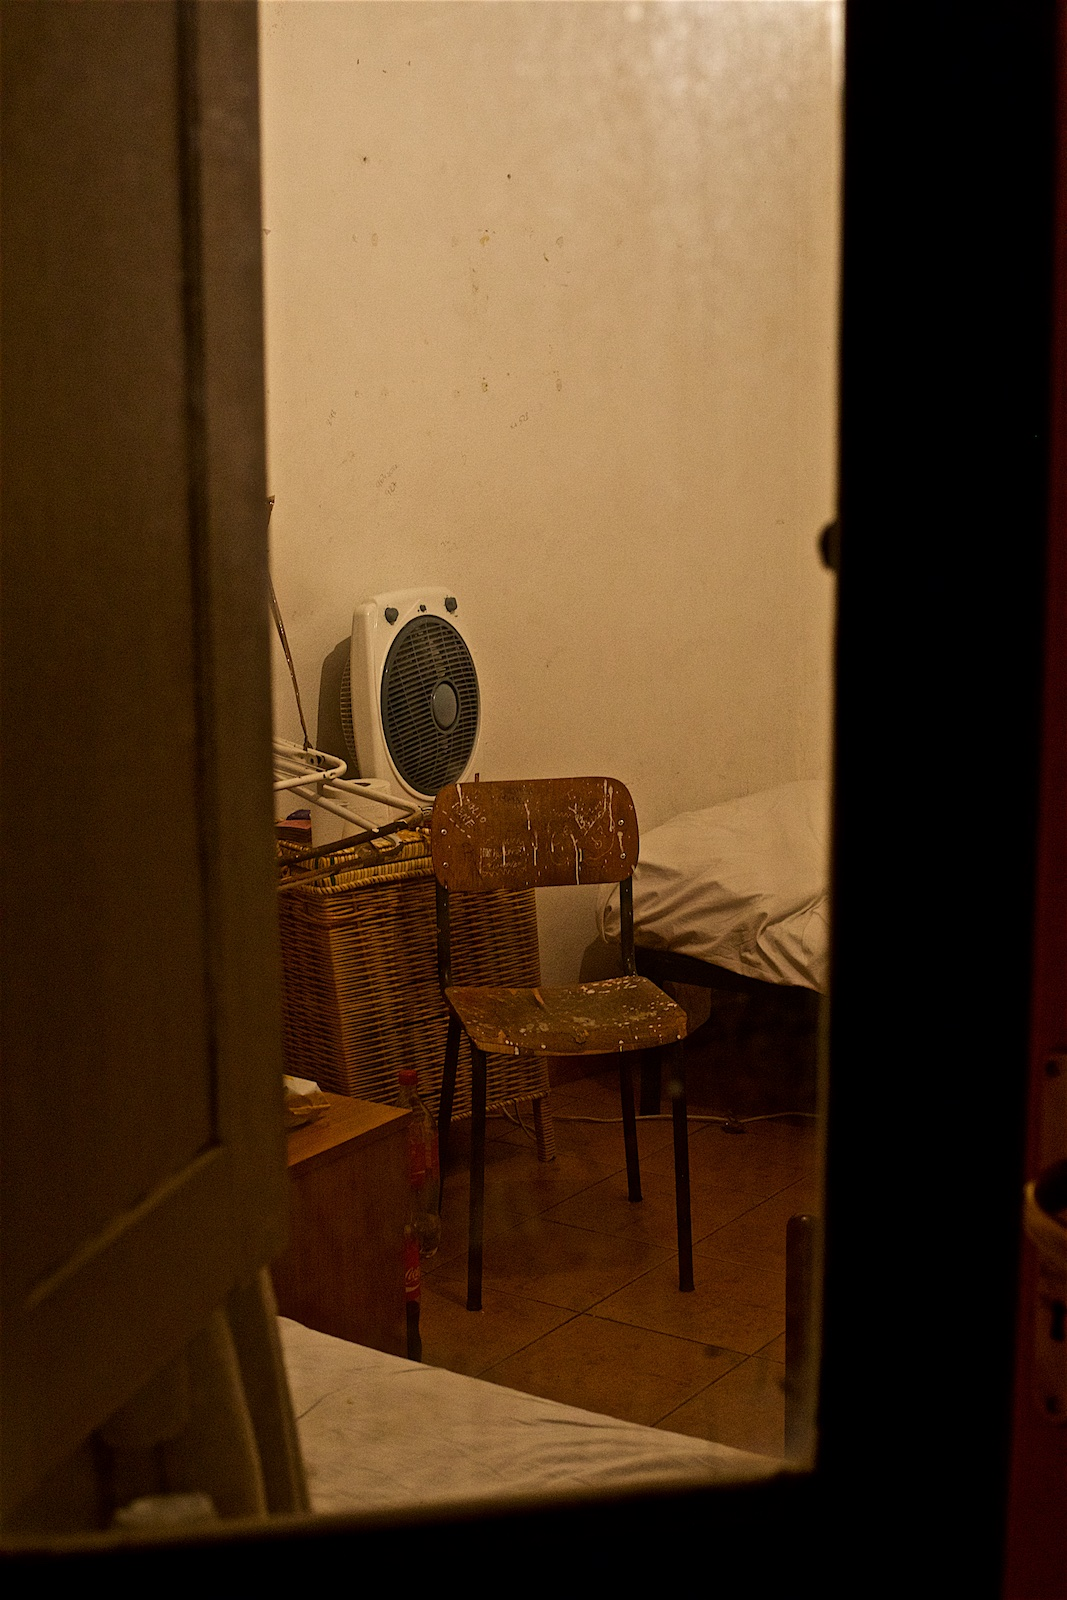 permanently-temporary-refugees-italy-rifugiati-italia-denis-bosnic-photography-portraits-17.jpg